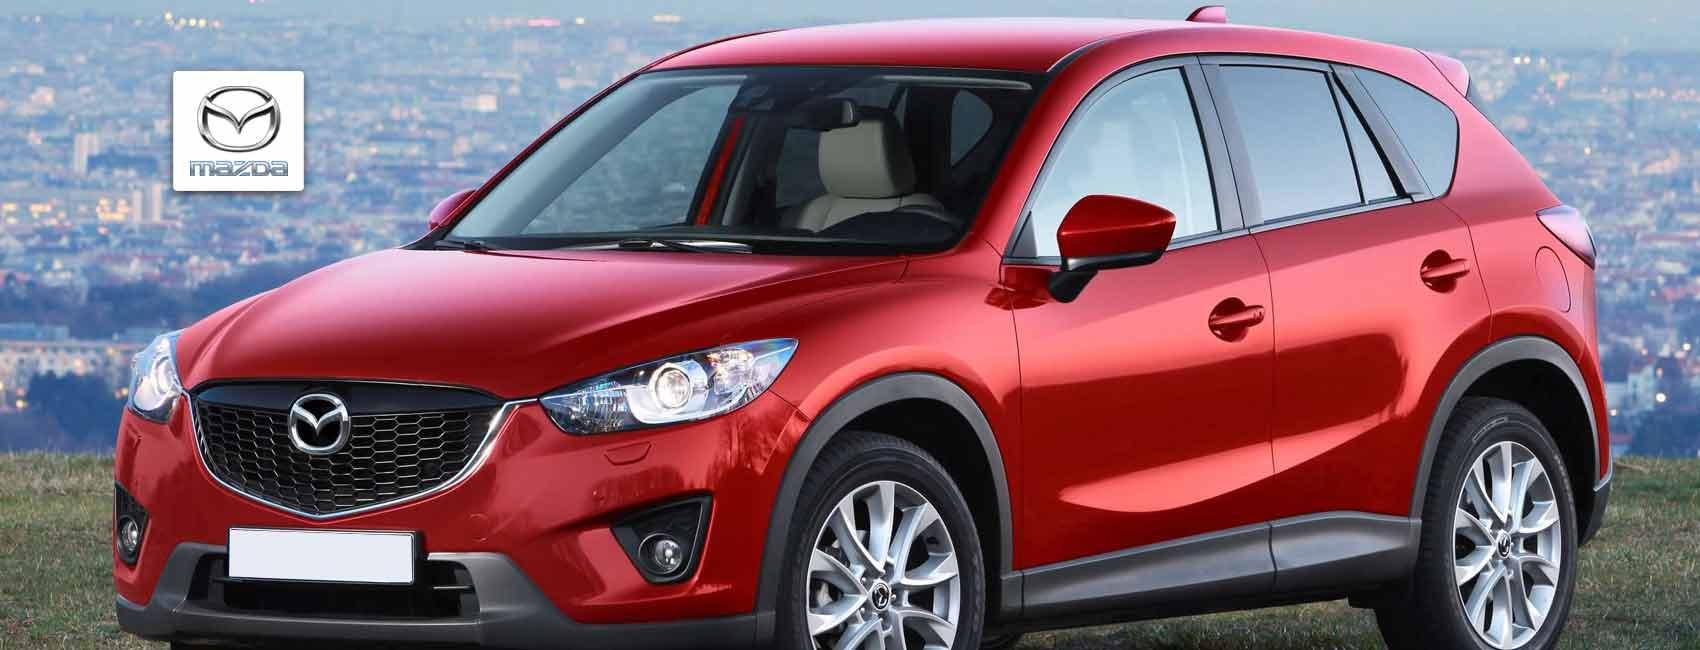 Mazda Rx7 Parts - Buy Used Mazda Rx7 Parts Online @ Best Price